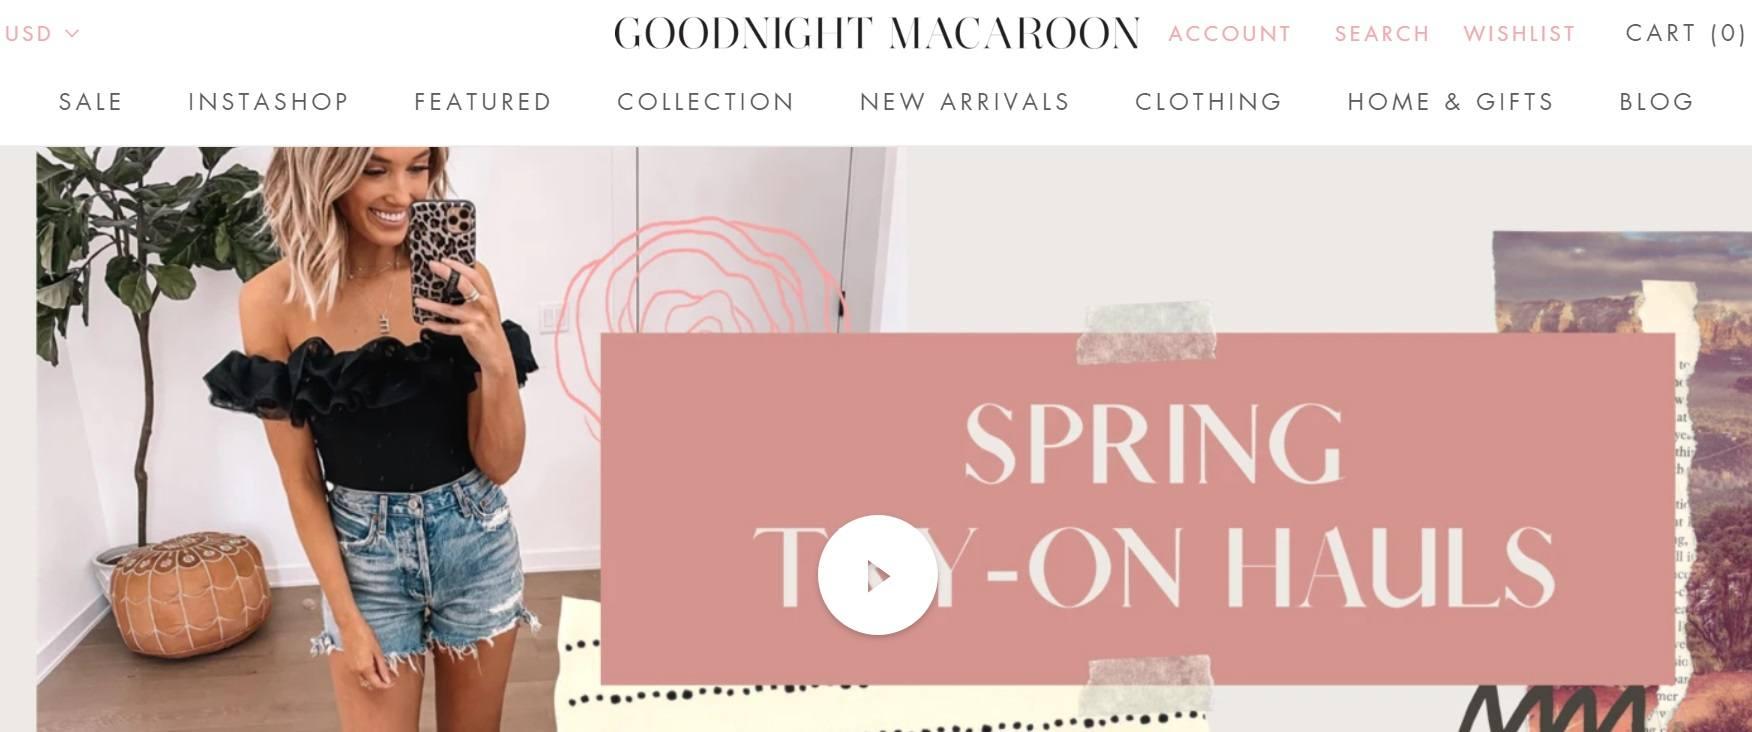 Goodnight Macaroon Spring Toy - On Hauls